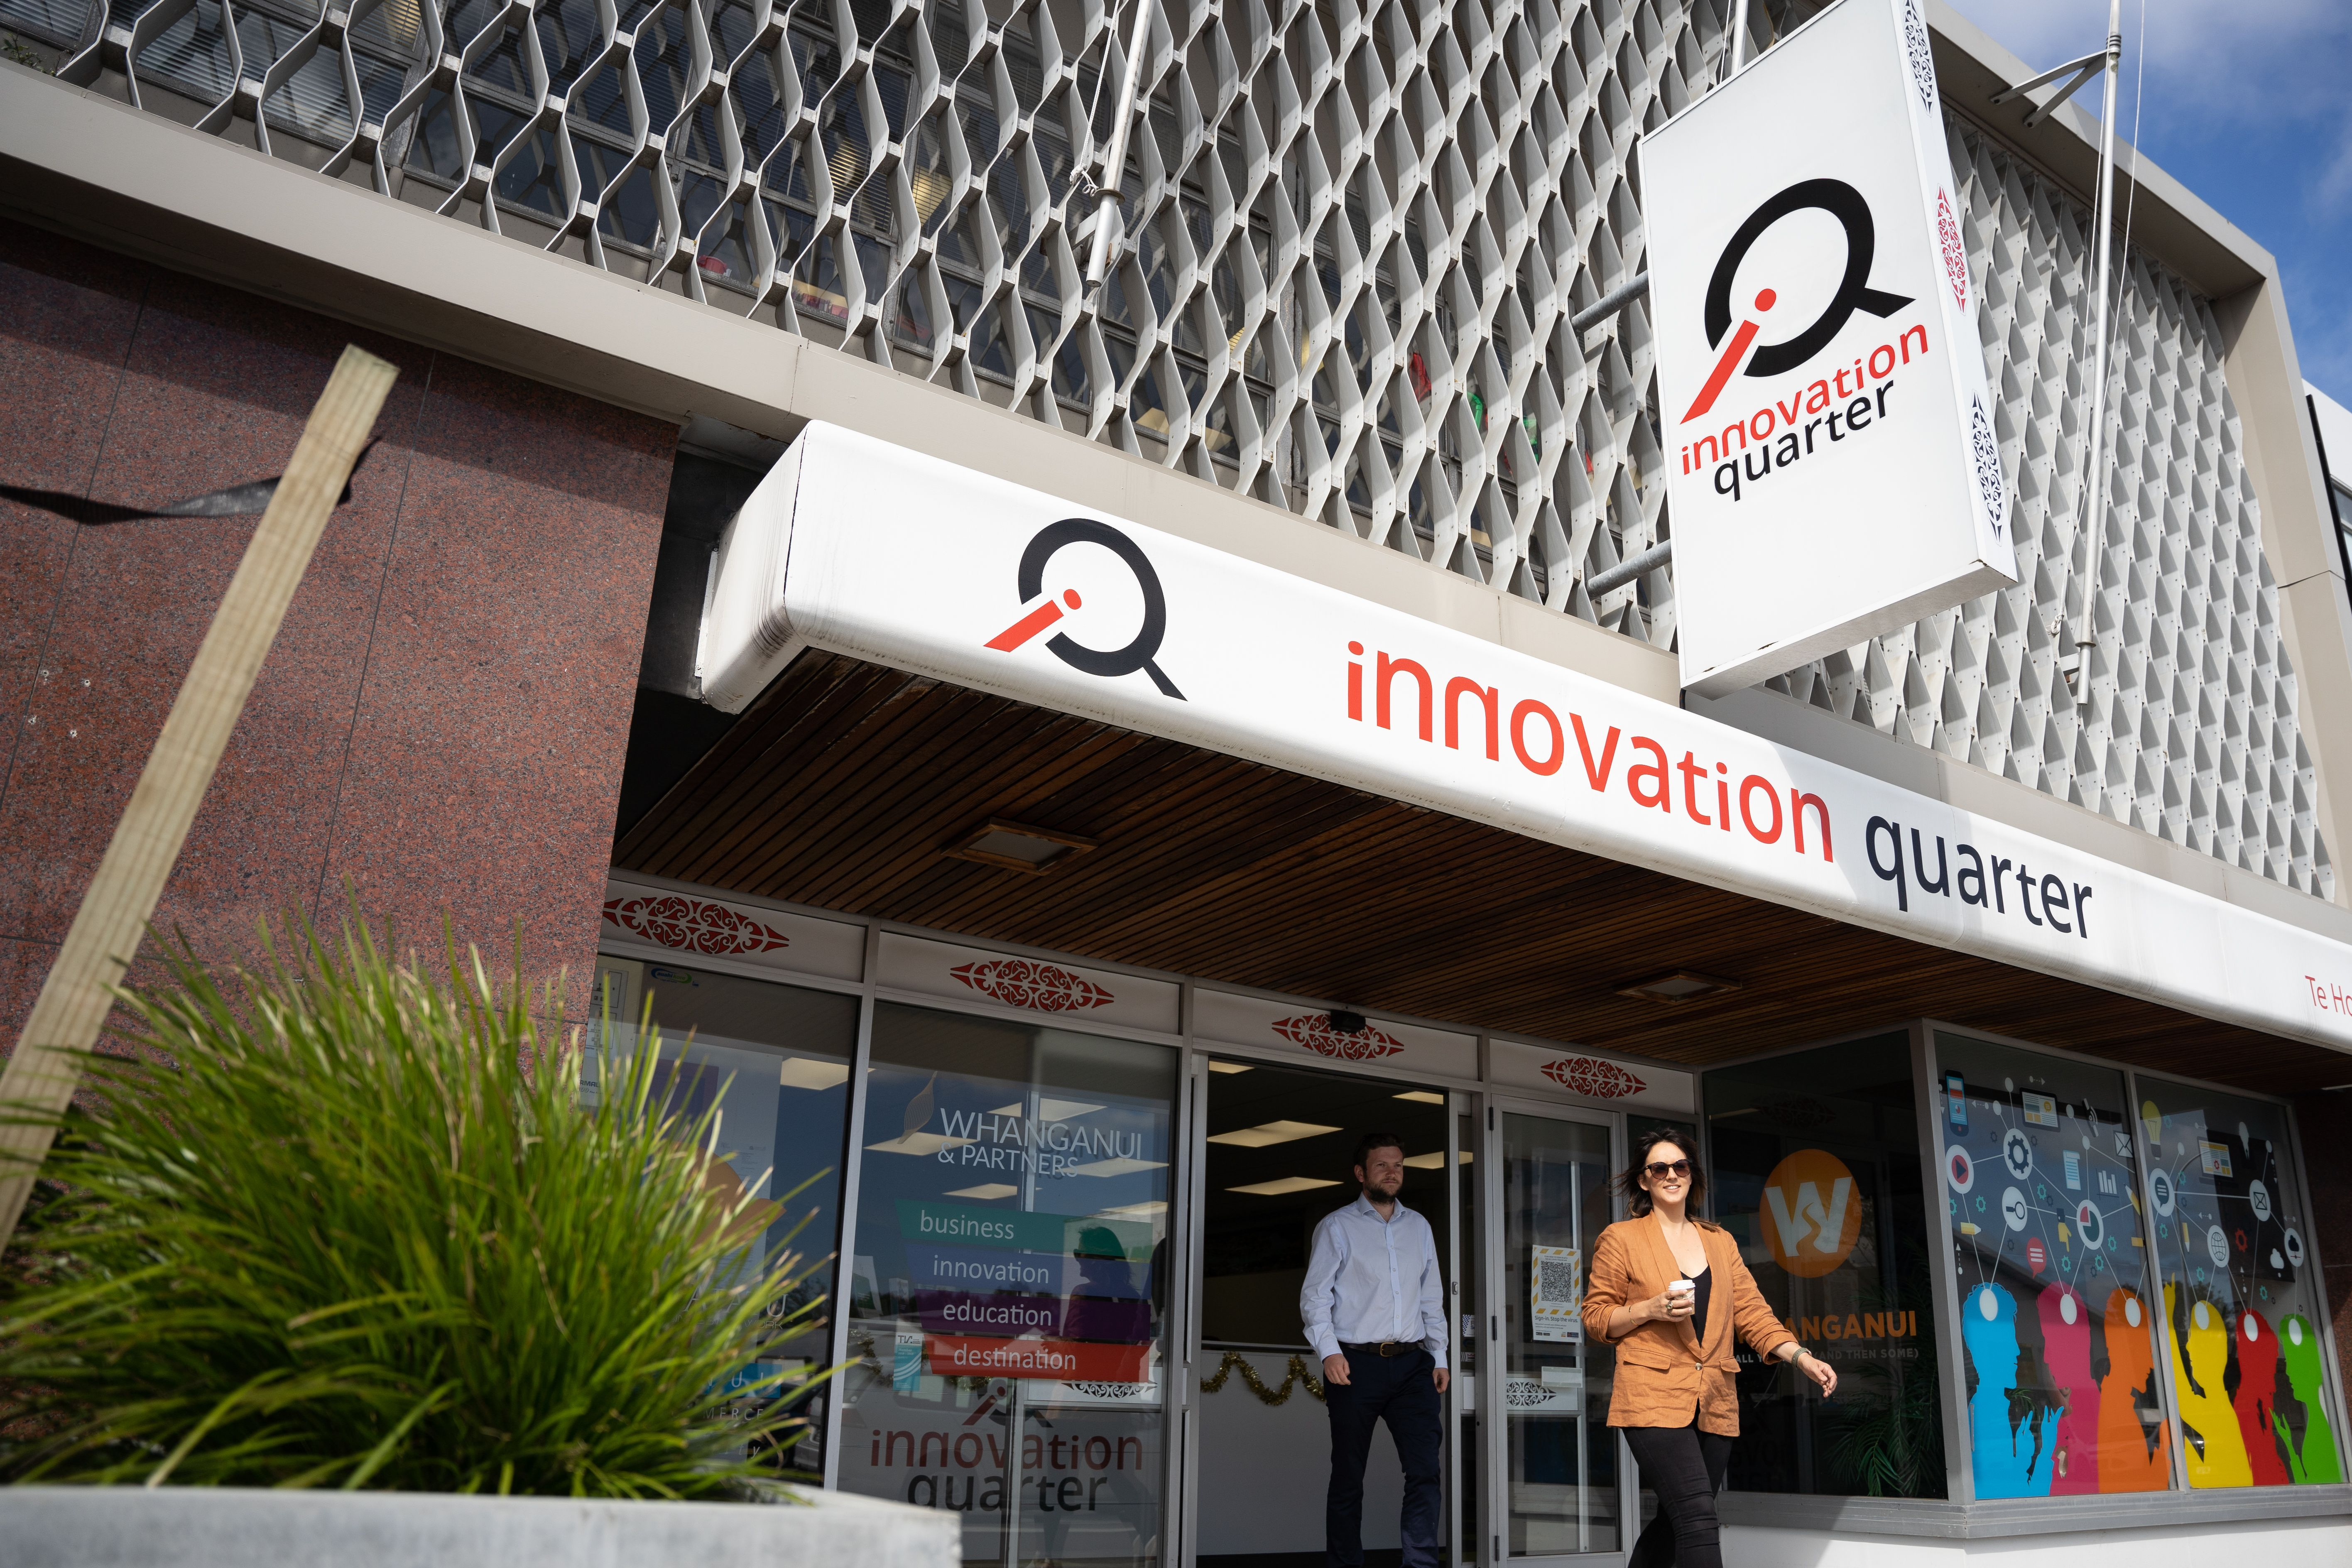 Innovation workshop will build technological understanding